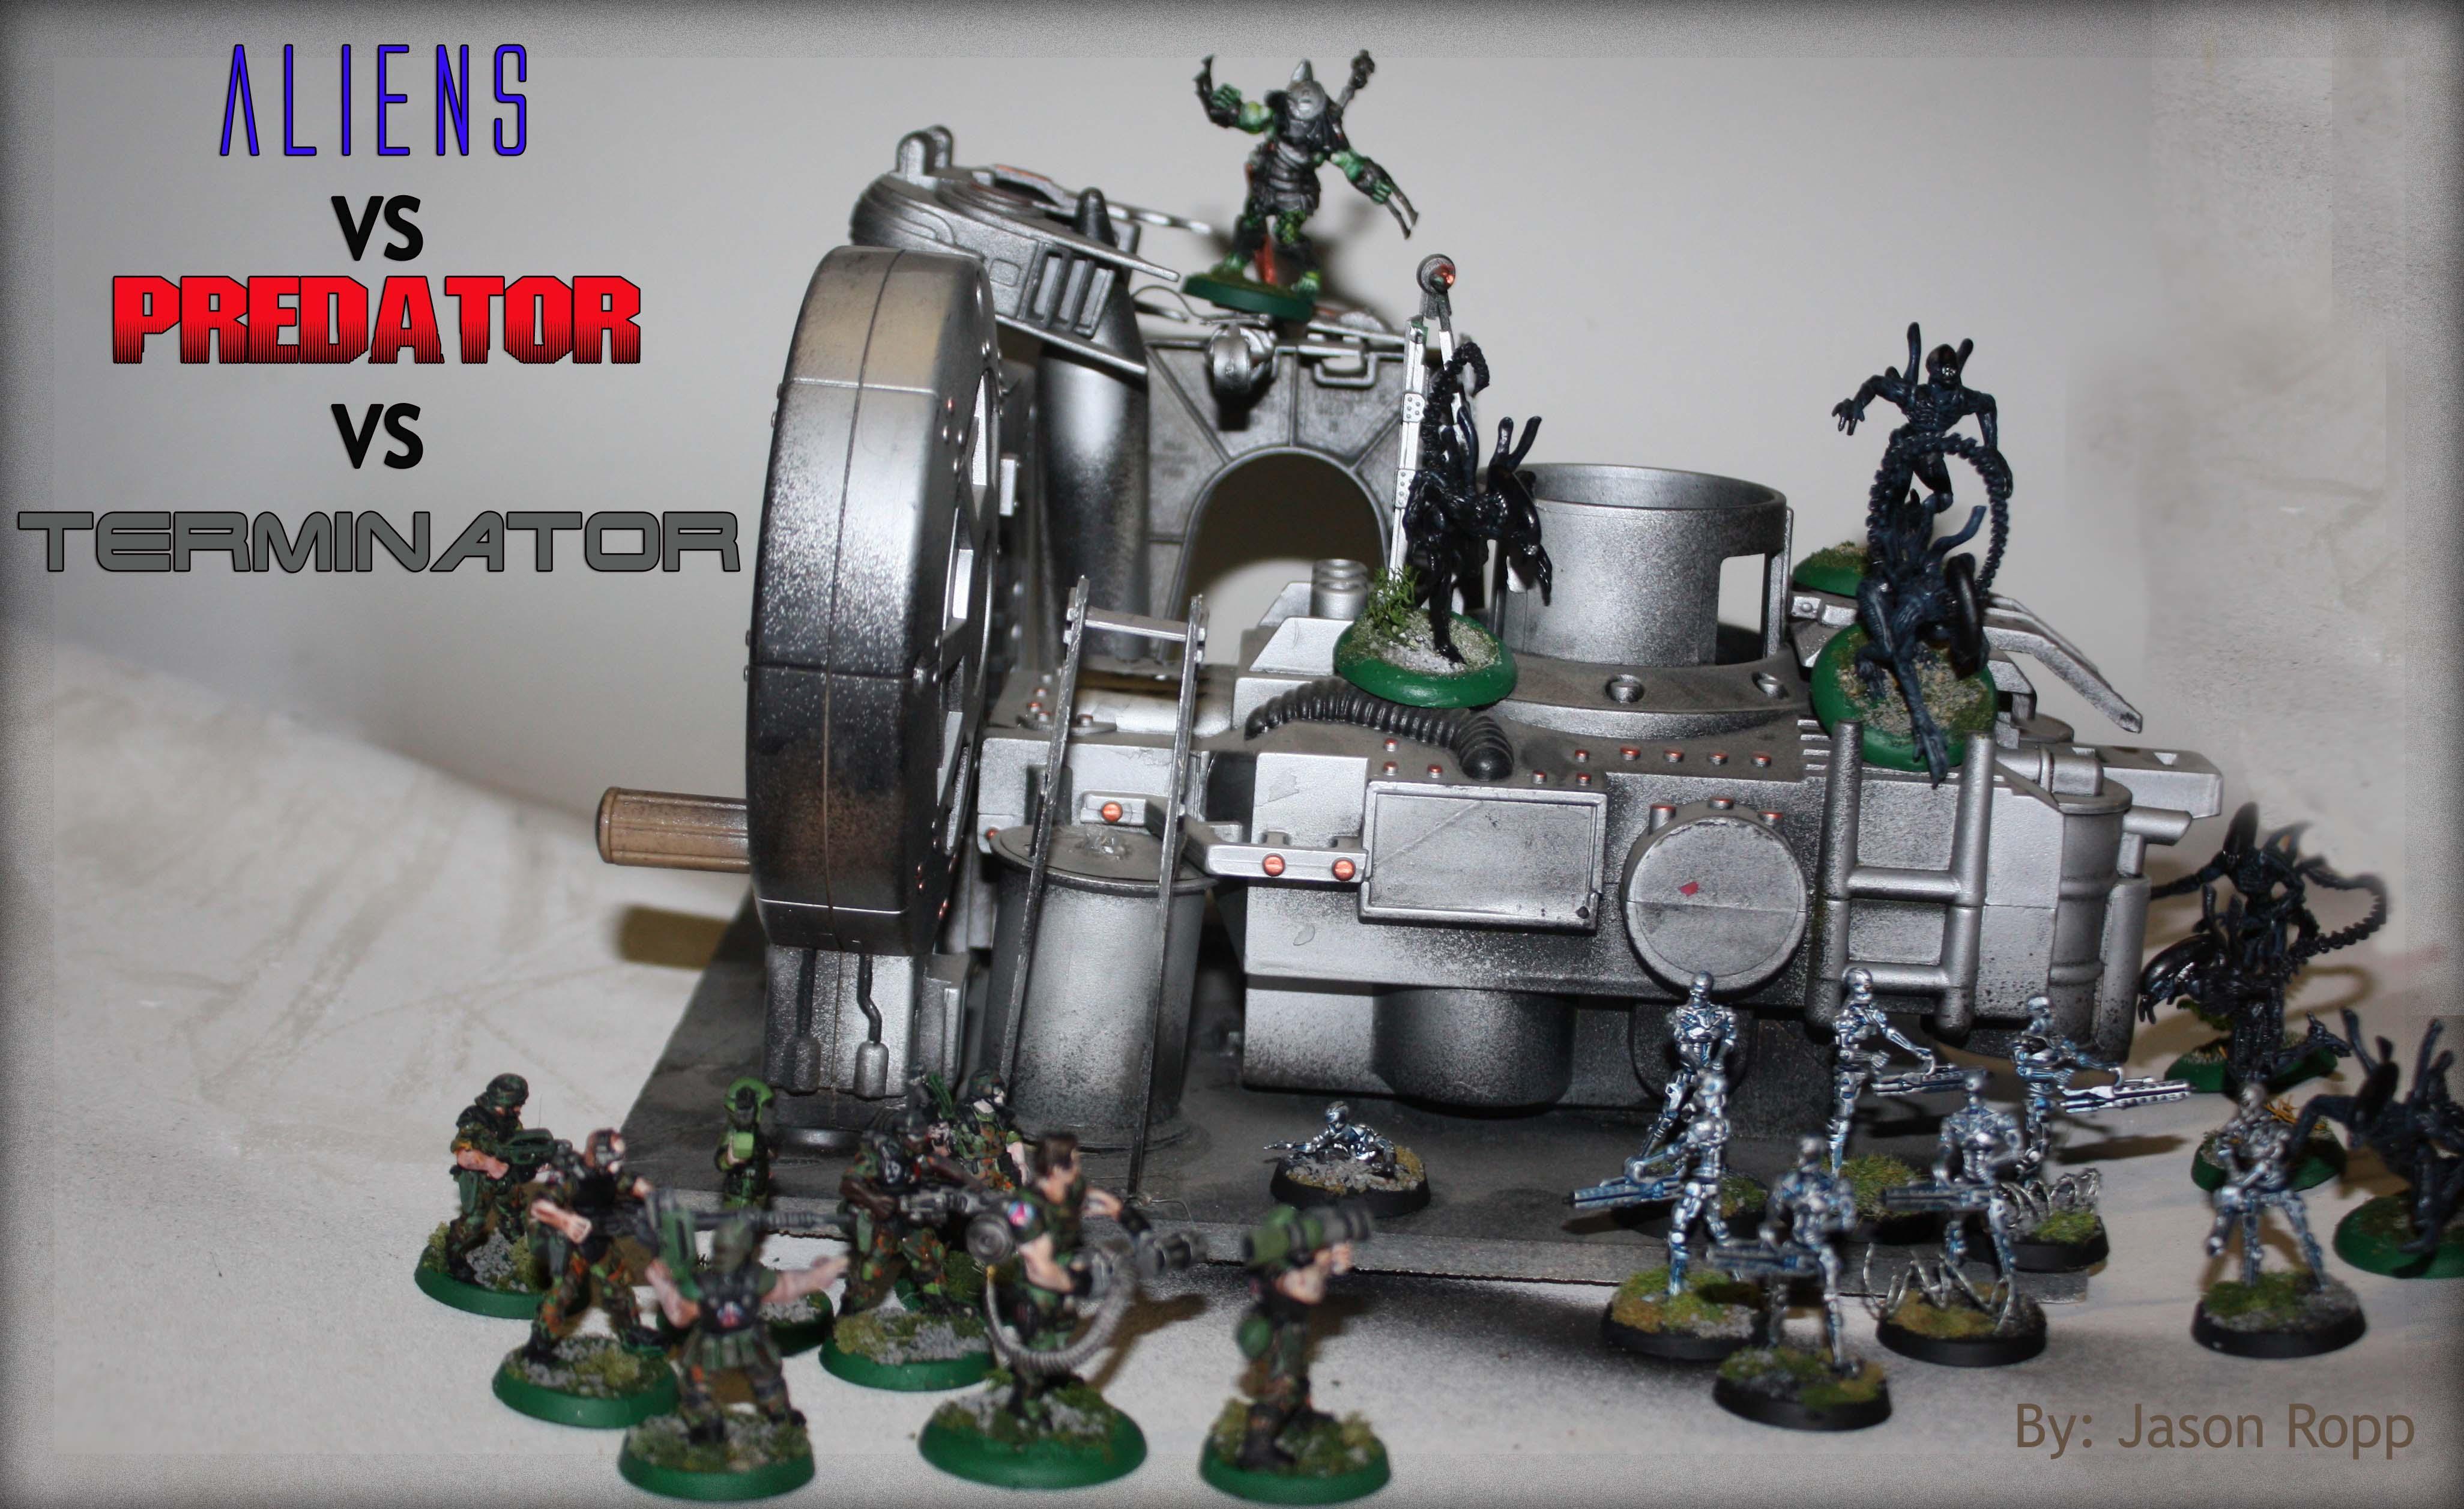 28mm, 32mm, Aliens, Avp, Avpvt, Battle, Dark Horse, Game, Gynisis, Heroclix, Horrorclix, Miniatures, Predator, Terminator Armor, Wargemer